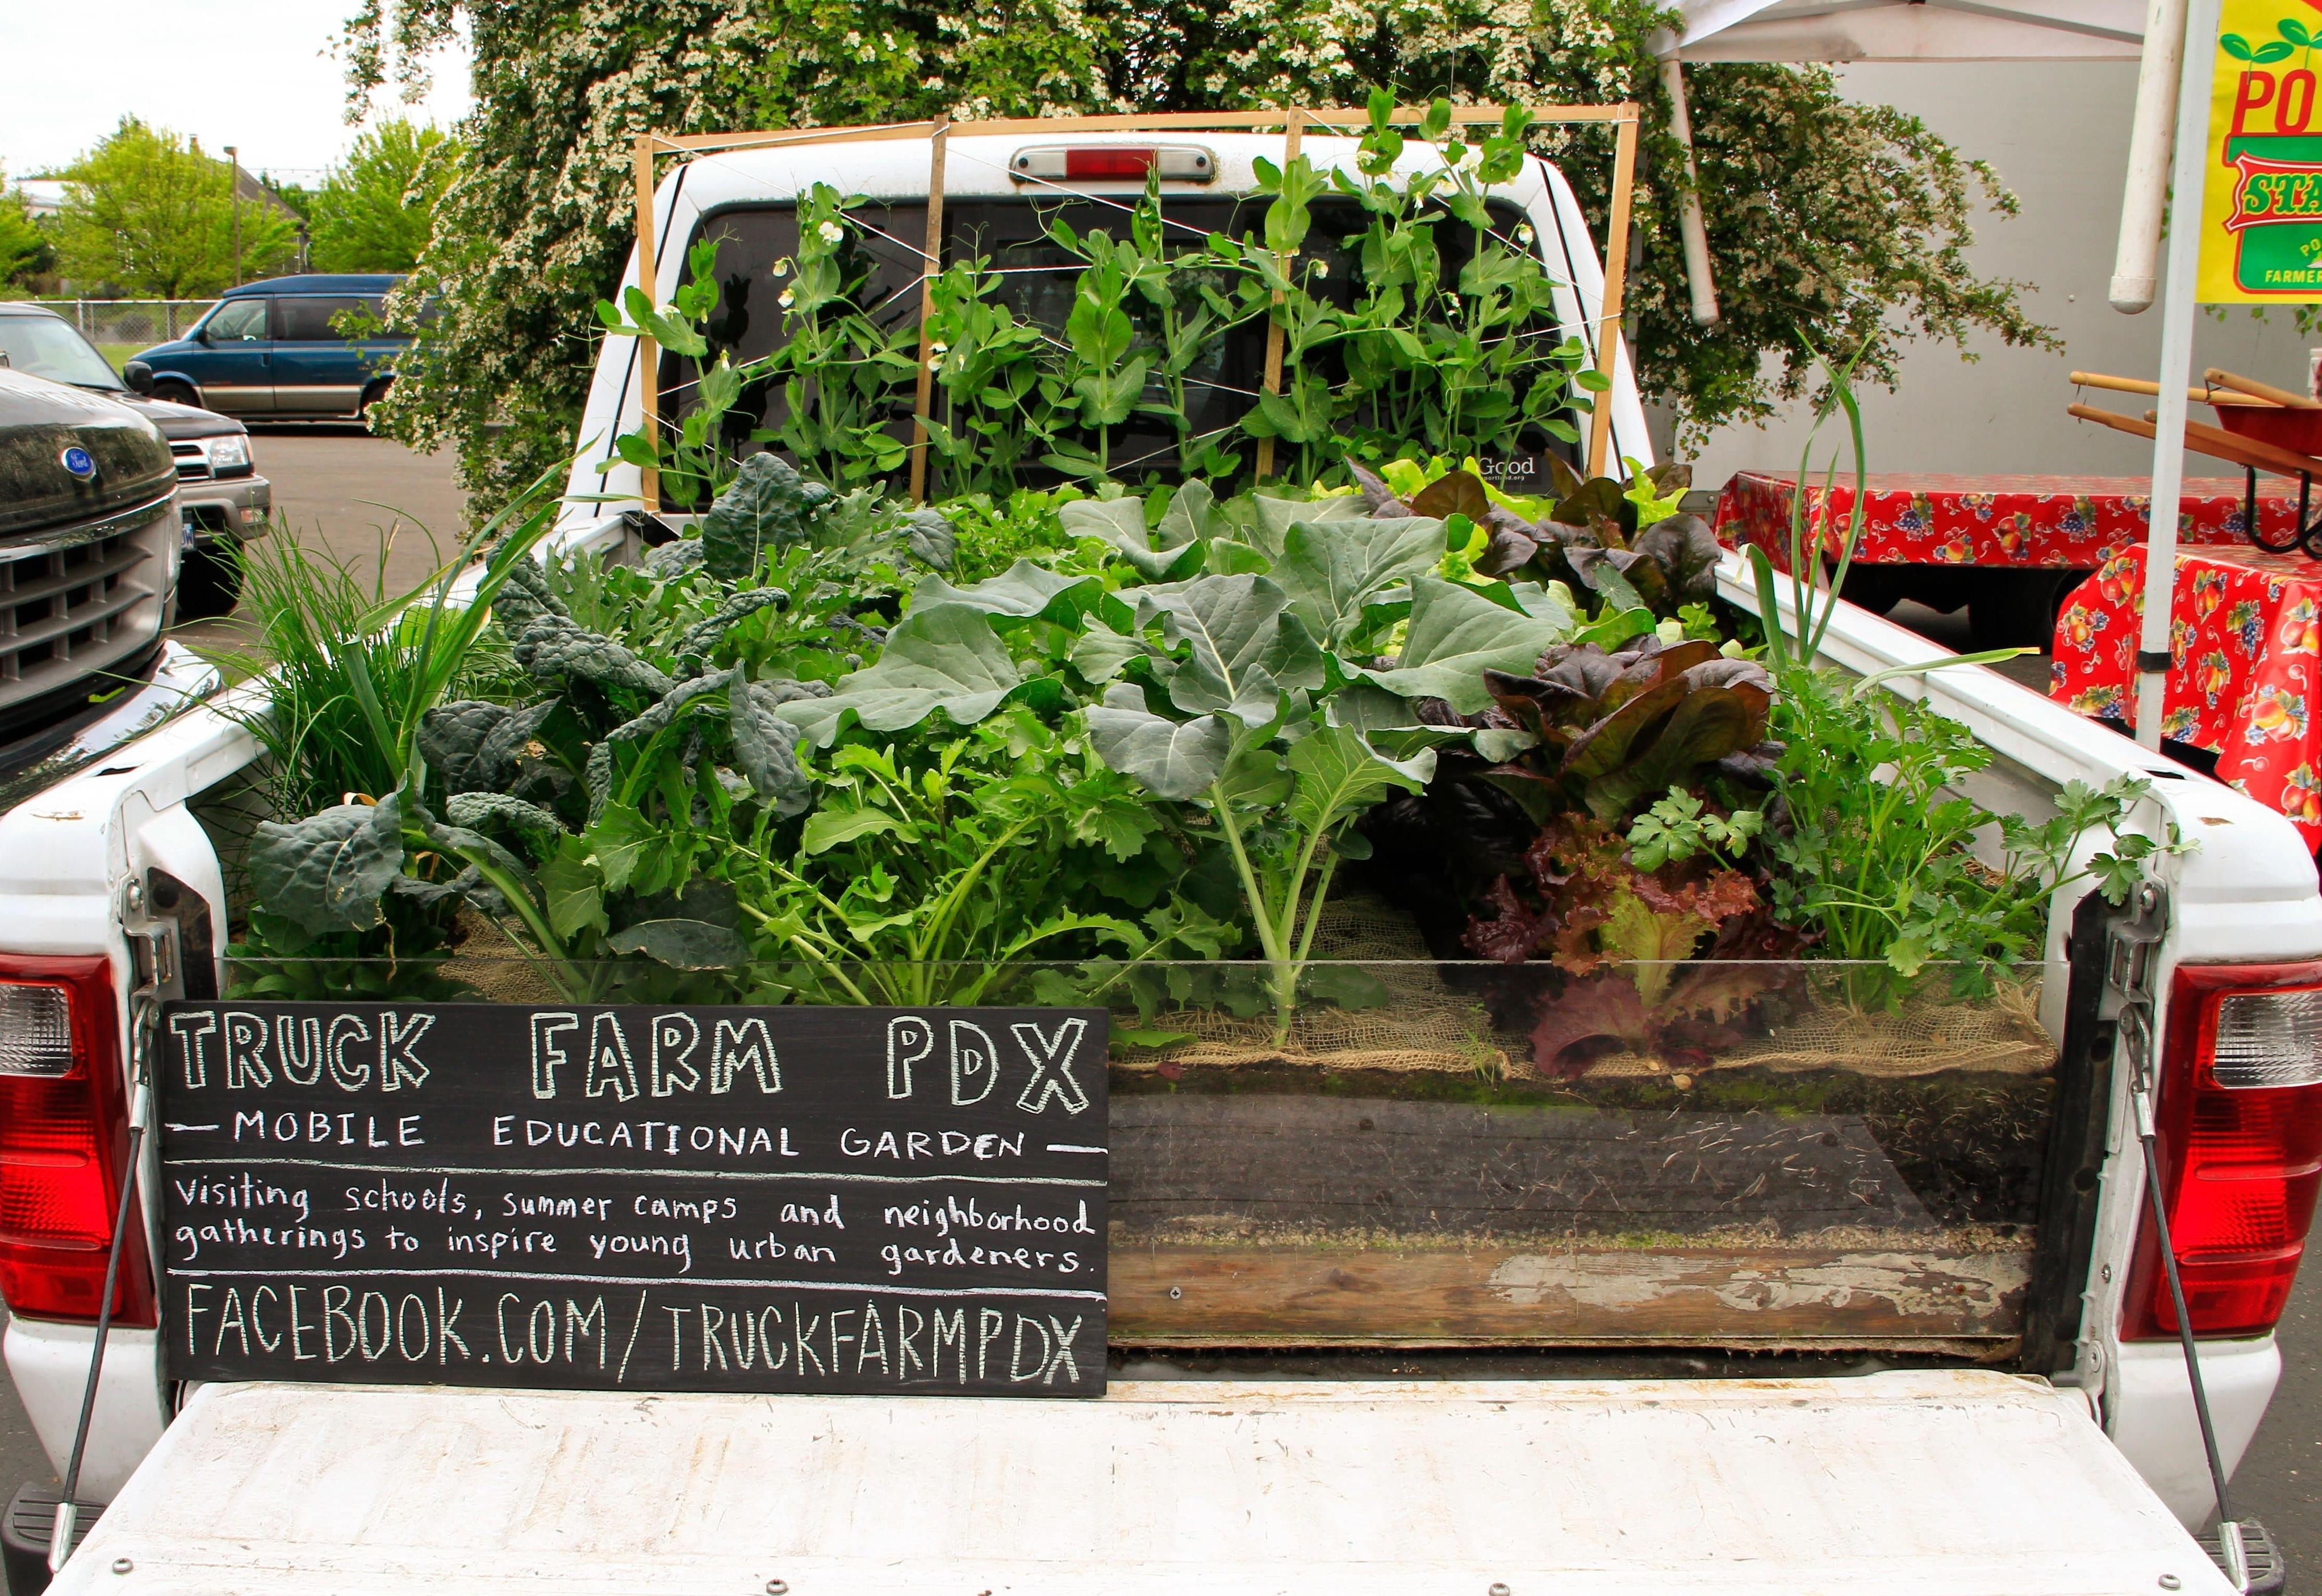 Mobile craigslist farm and garden